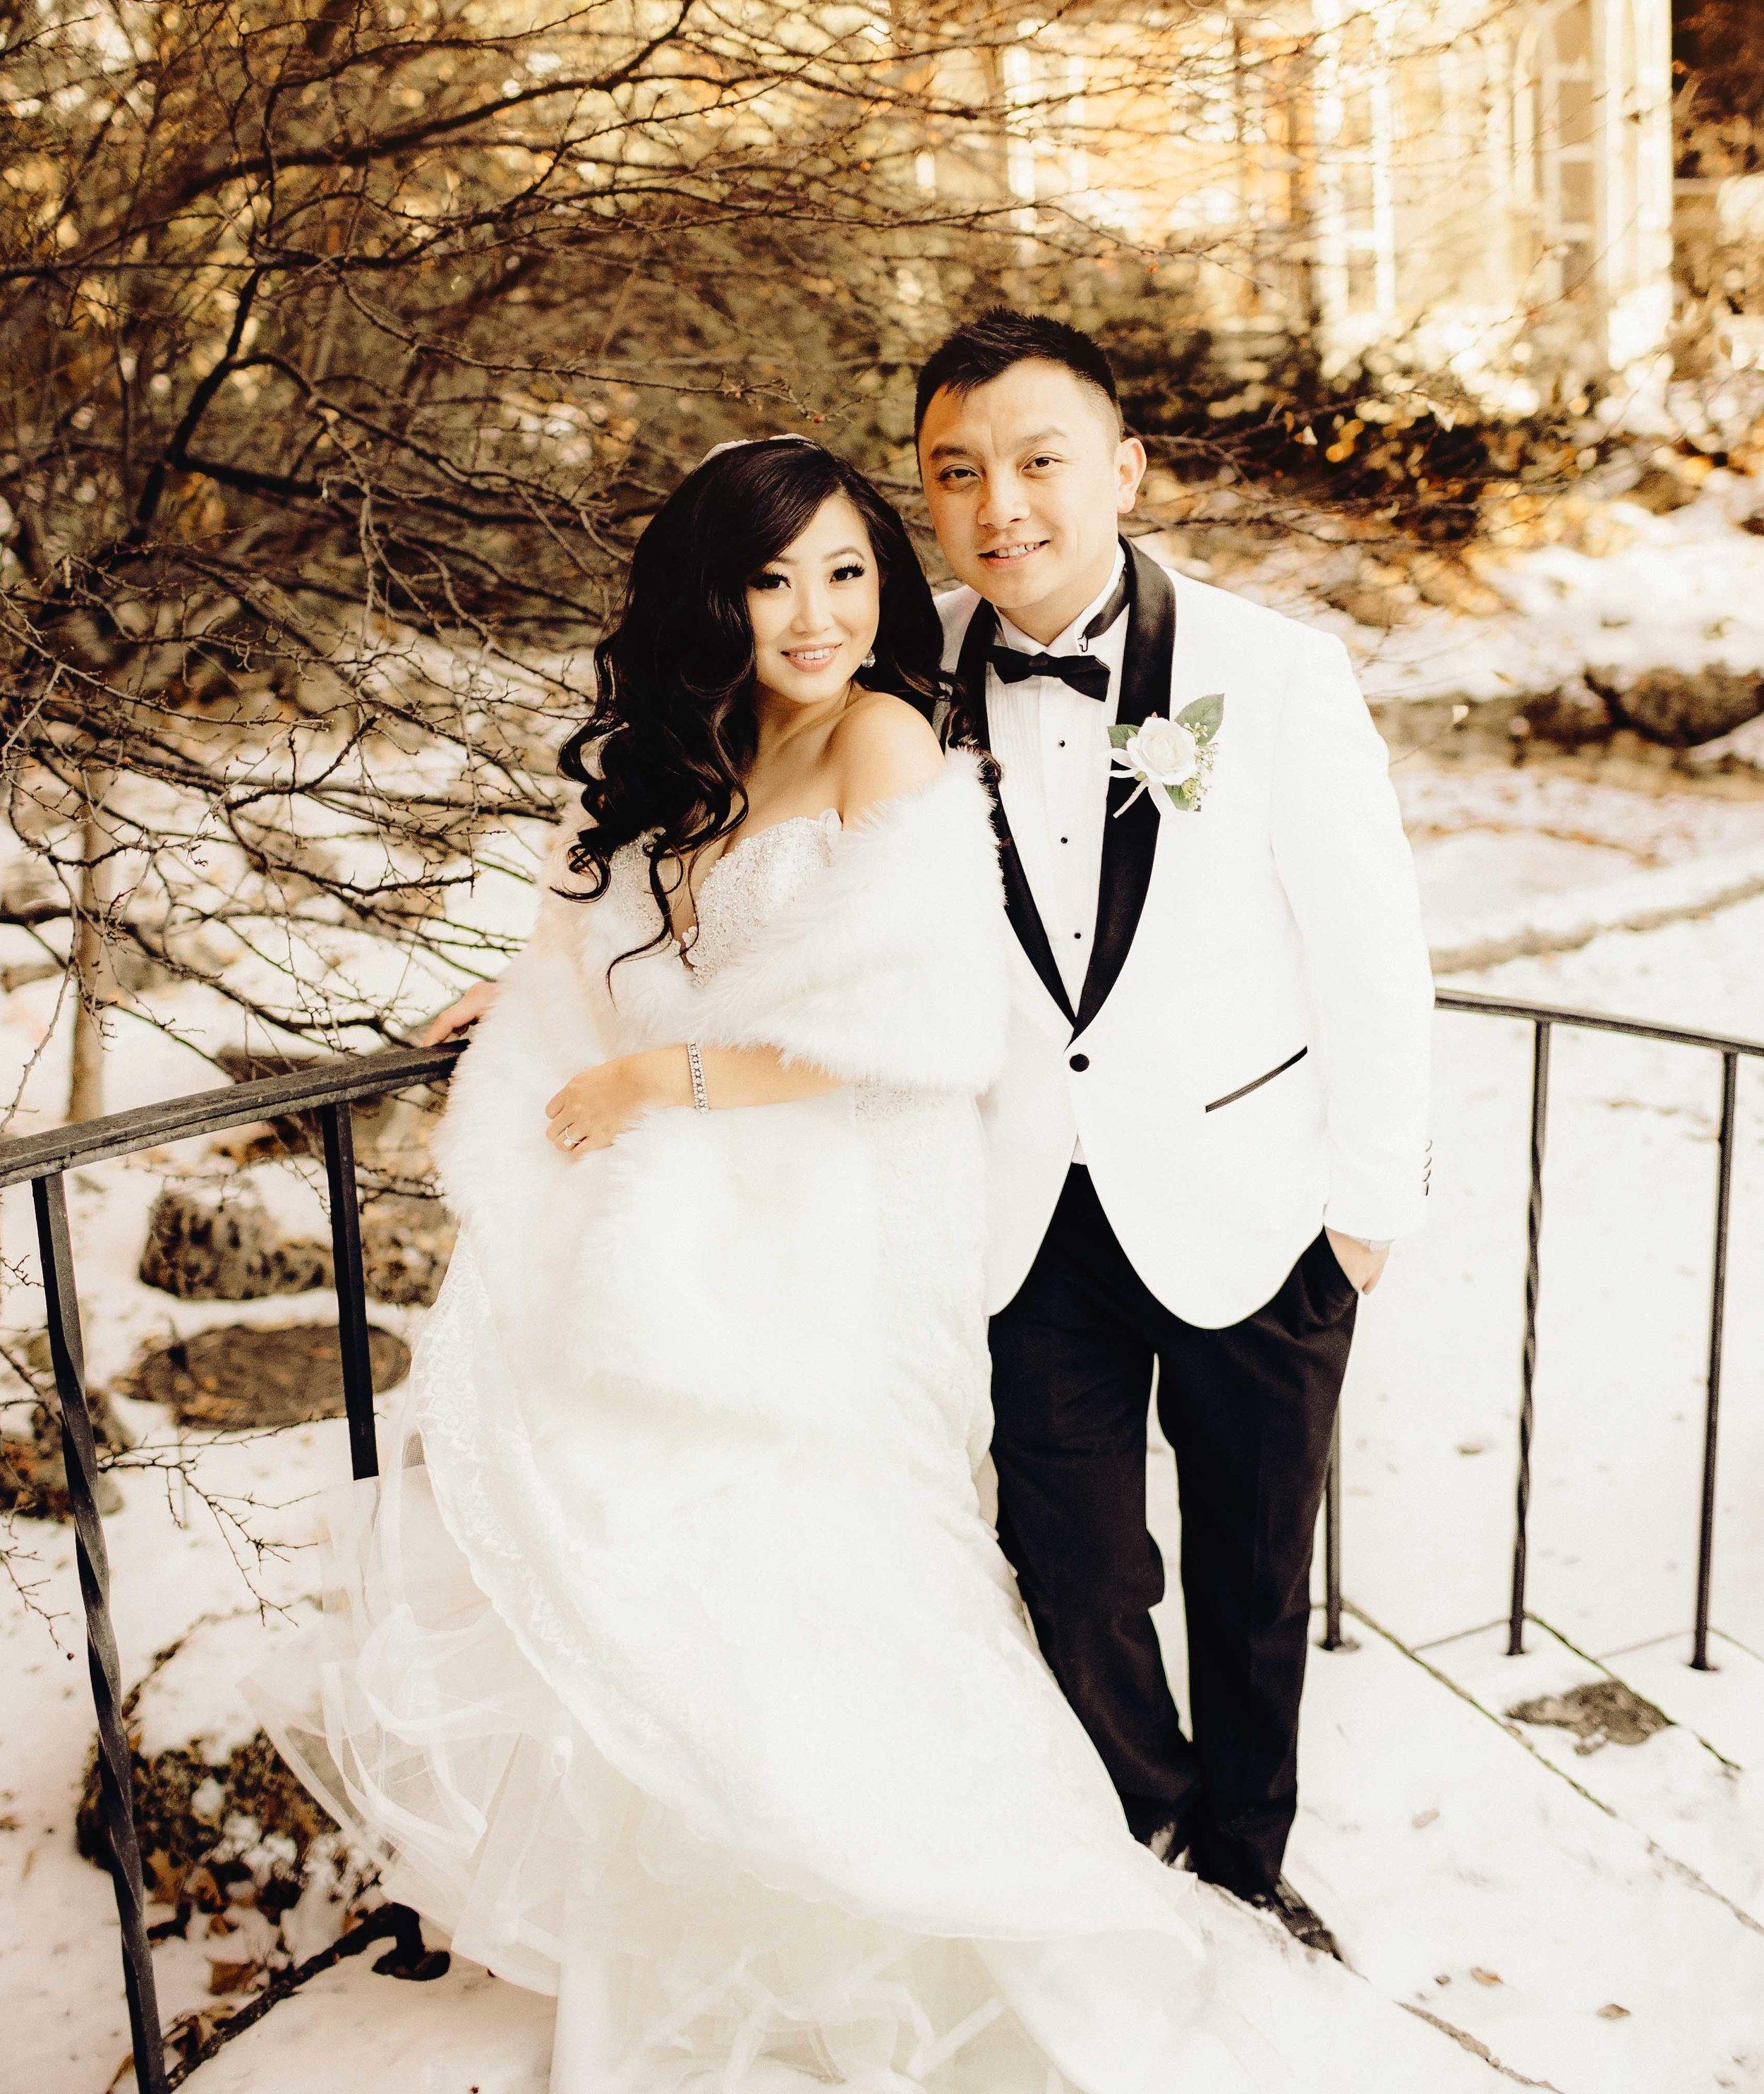 Honey + Yao, Part II, The Bride and Groom-92.jpg